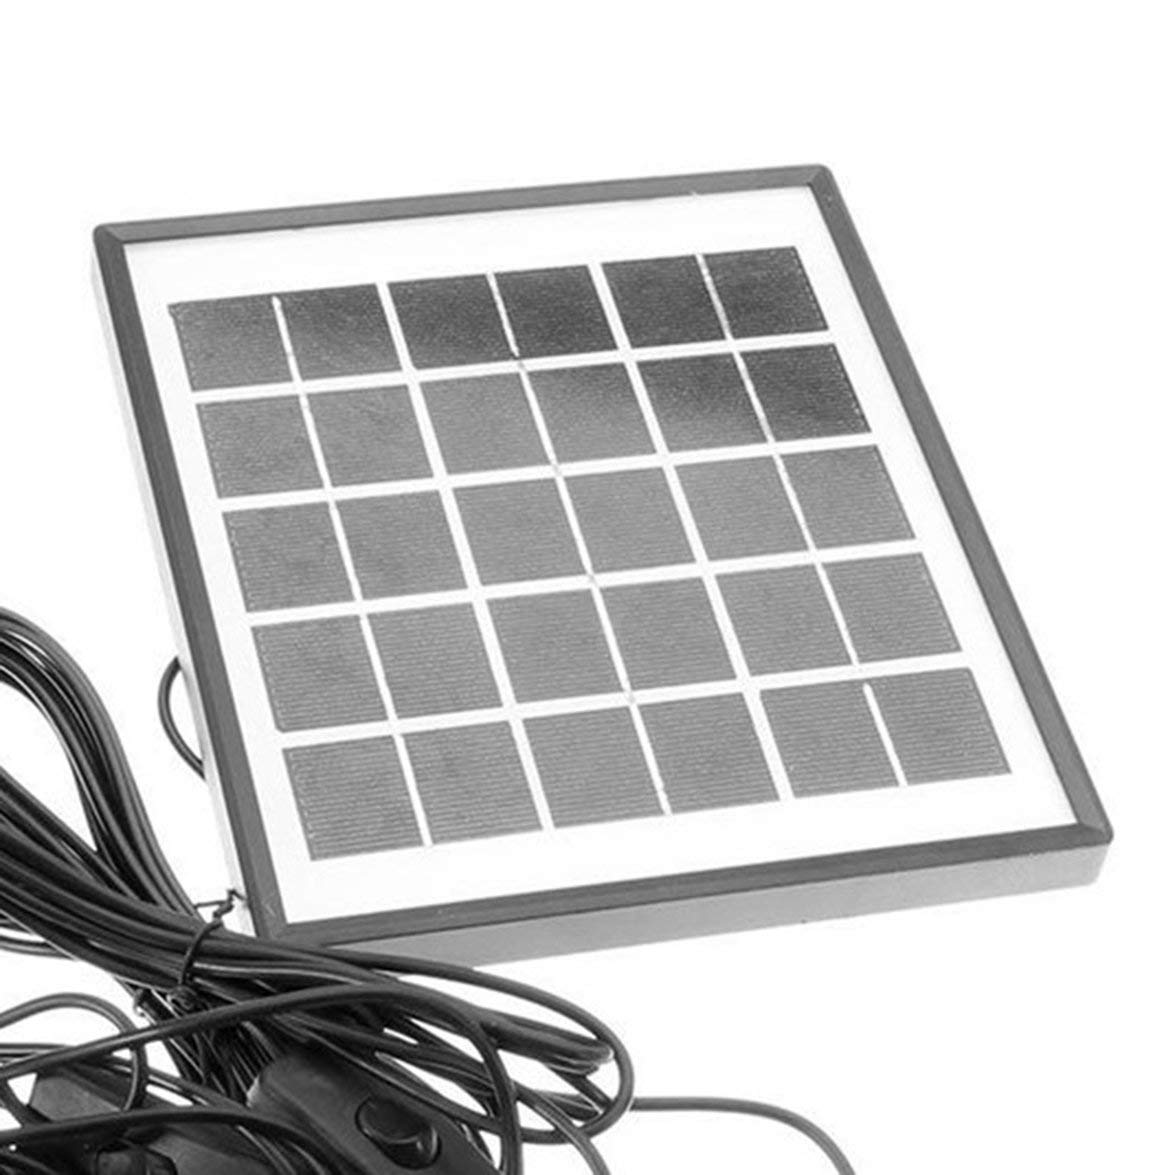 Kongqiabona 4W 6V Outdoor Solar Power Panel LED Light Lamp Charger Home Garden System Kit